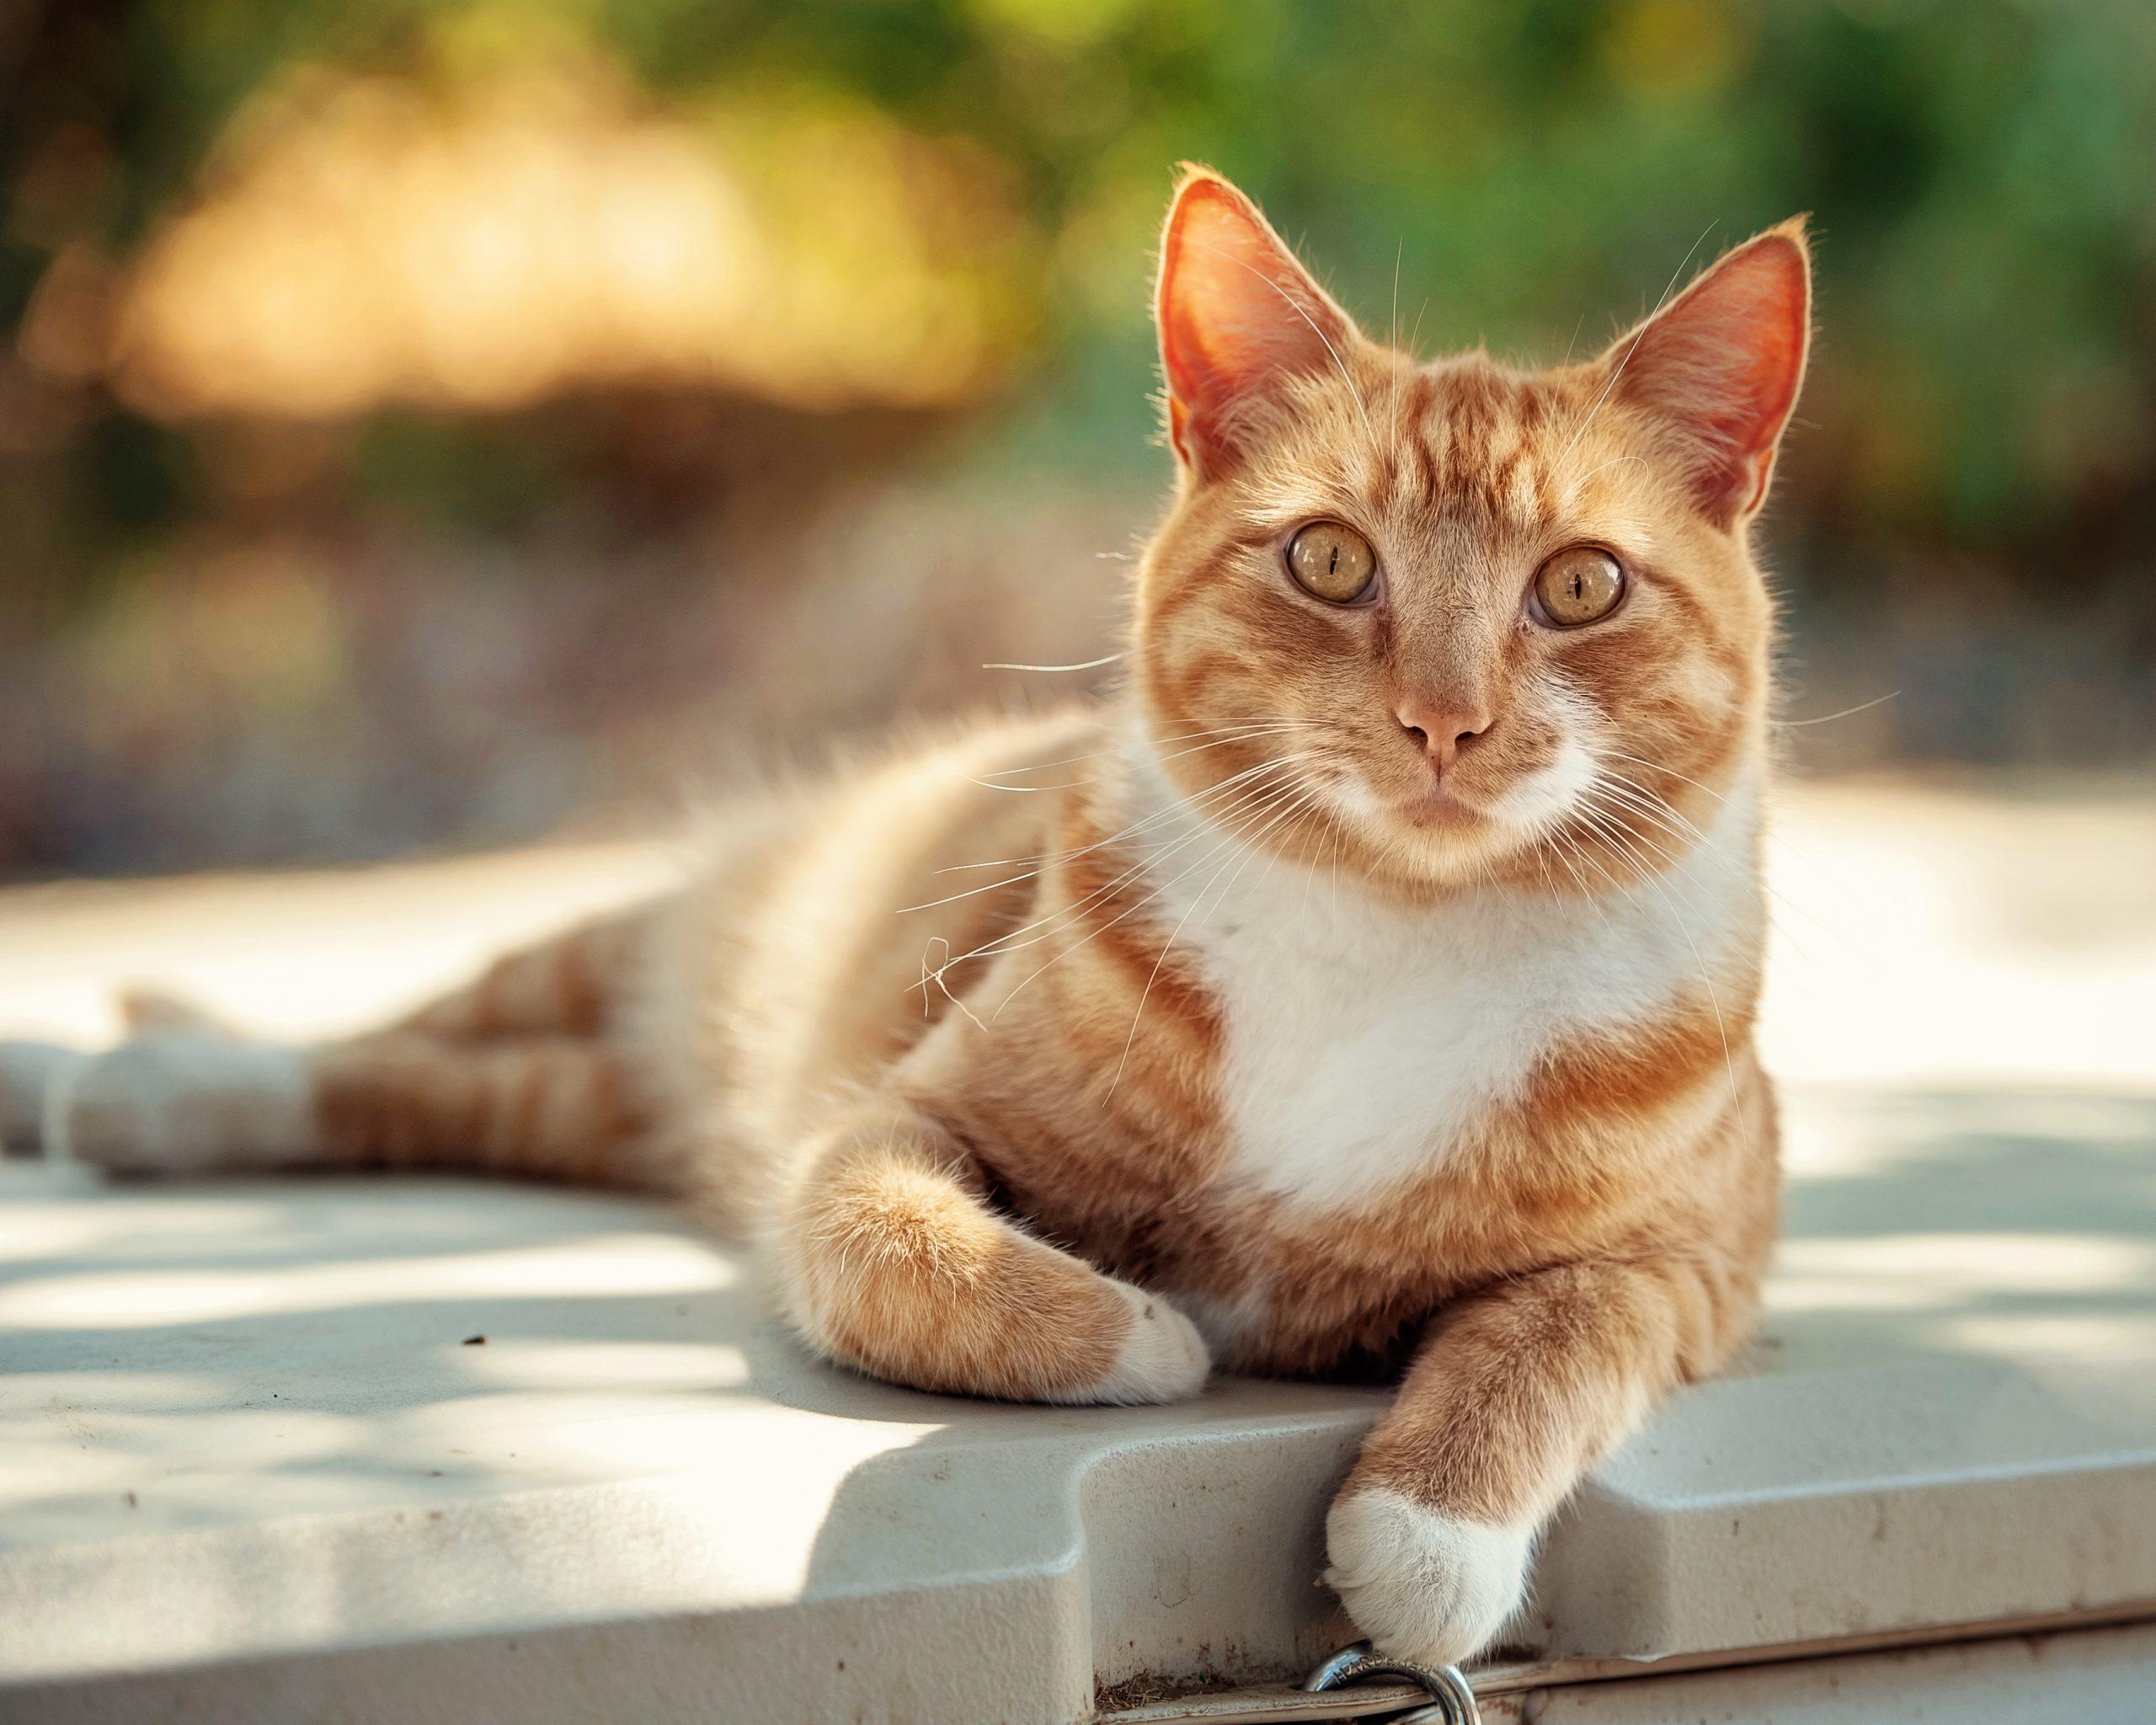 cat oustside